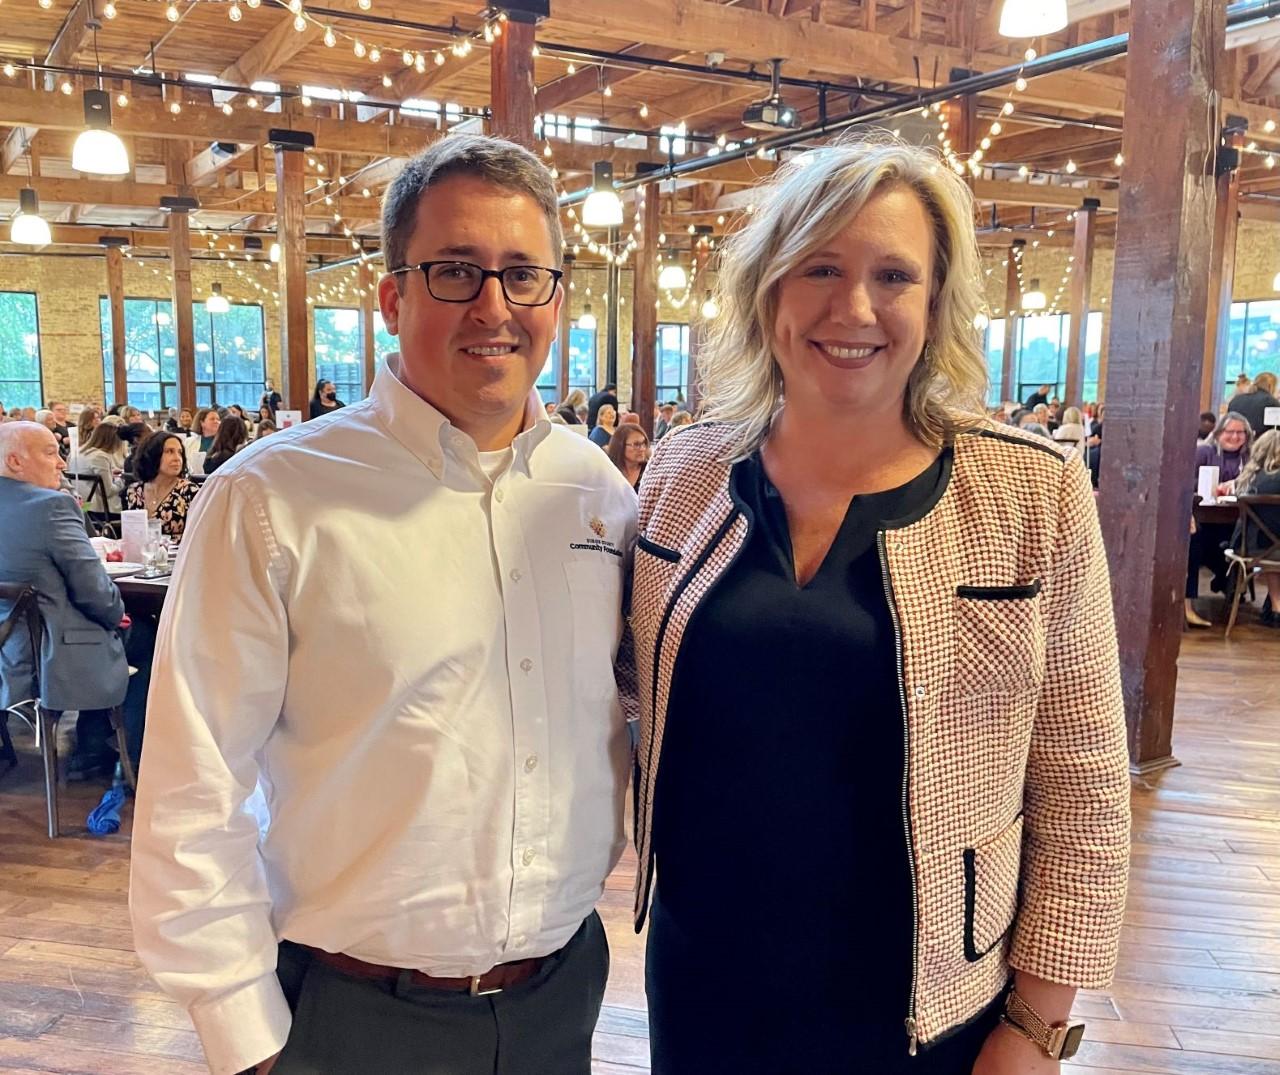 Dubois County CF Executive Director Clayton Boyles and Dove House Executive Director Wendy Noe